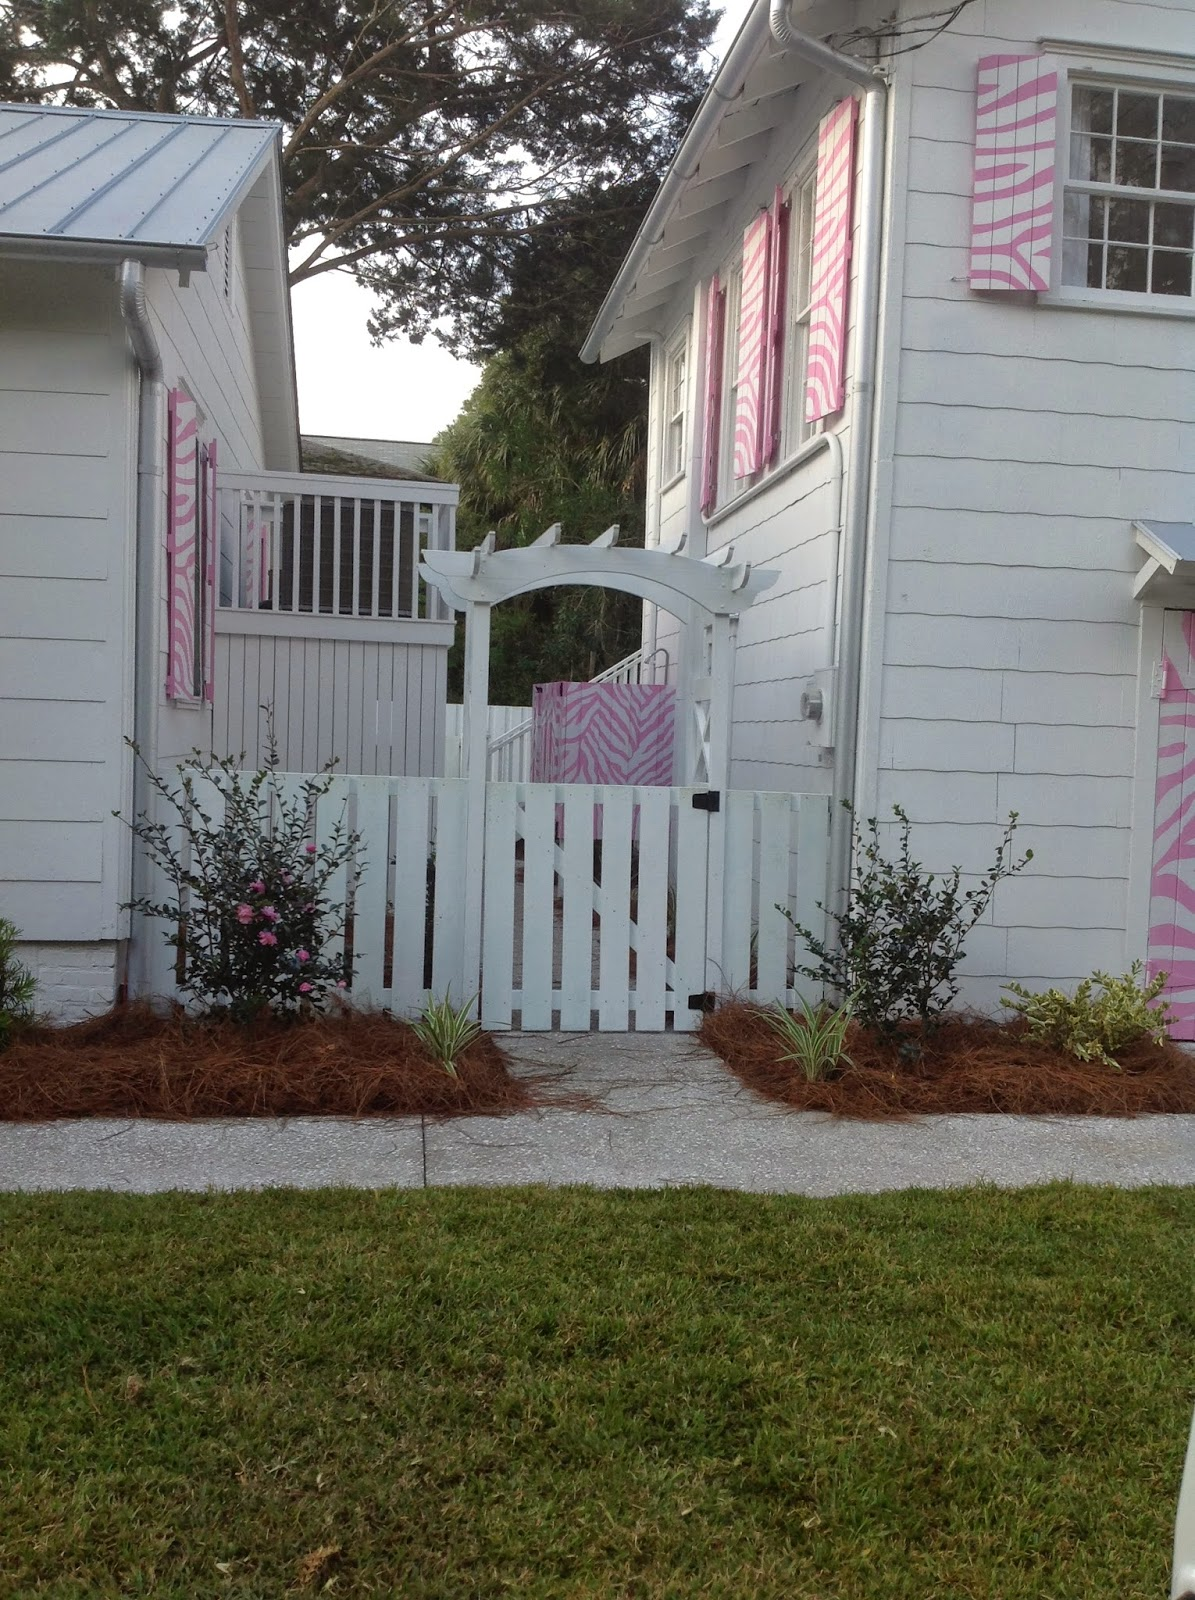 Jane Coslick Cottages My Favorite Bedroom And More: Jane Coslick Cottages : The Pink Zebra Cottage